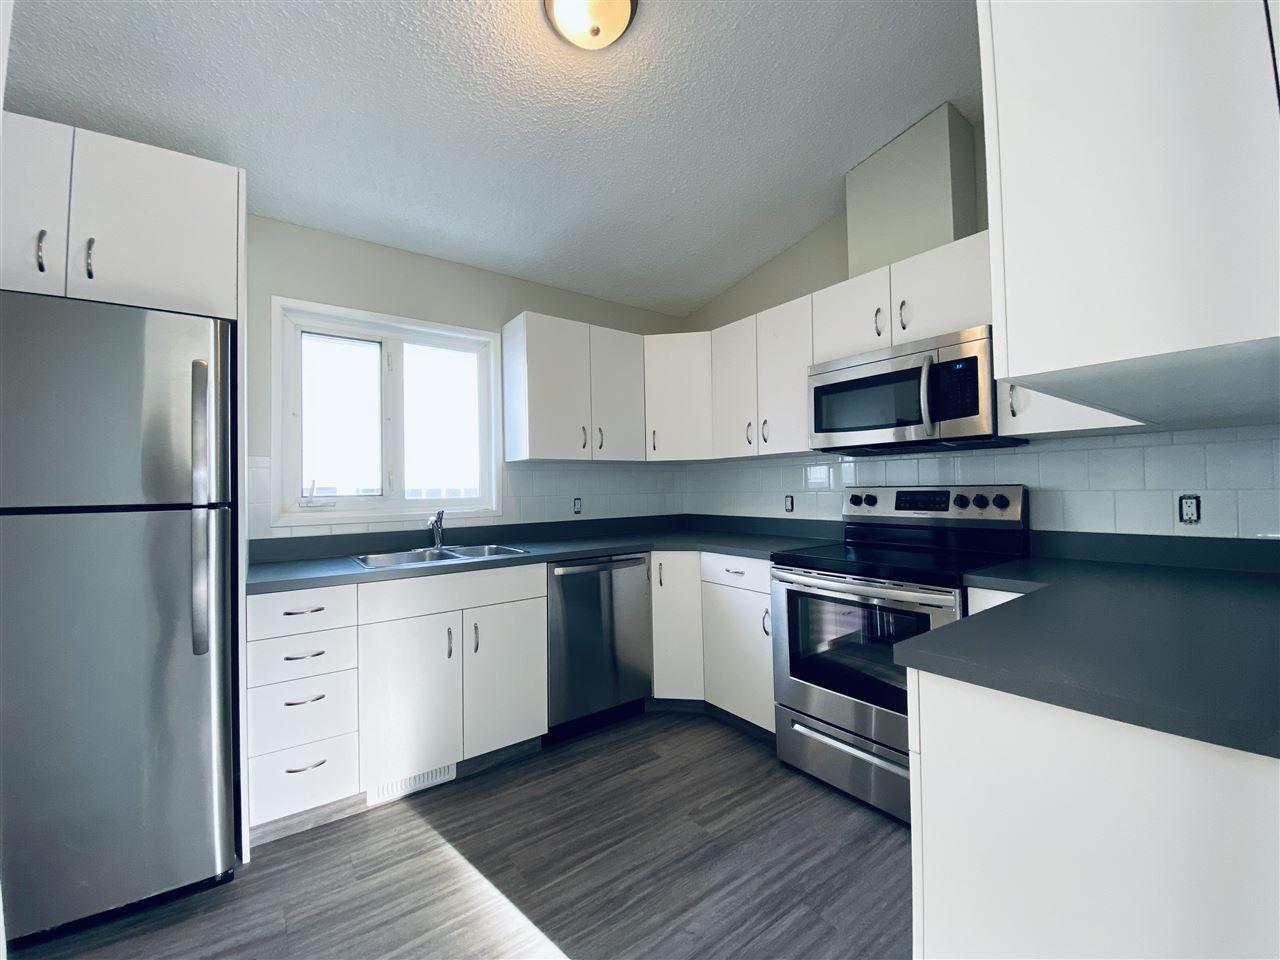 Main Photo: 60 Dayton Crescent NW: St. Albert House for sale : MLS®# E4241908